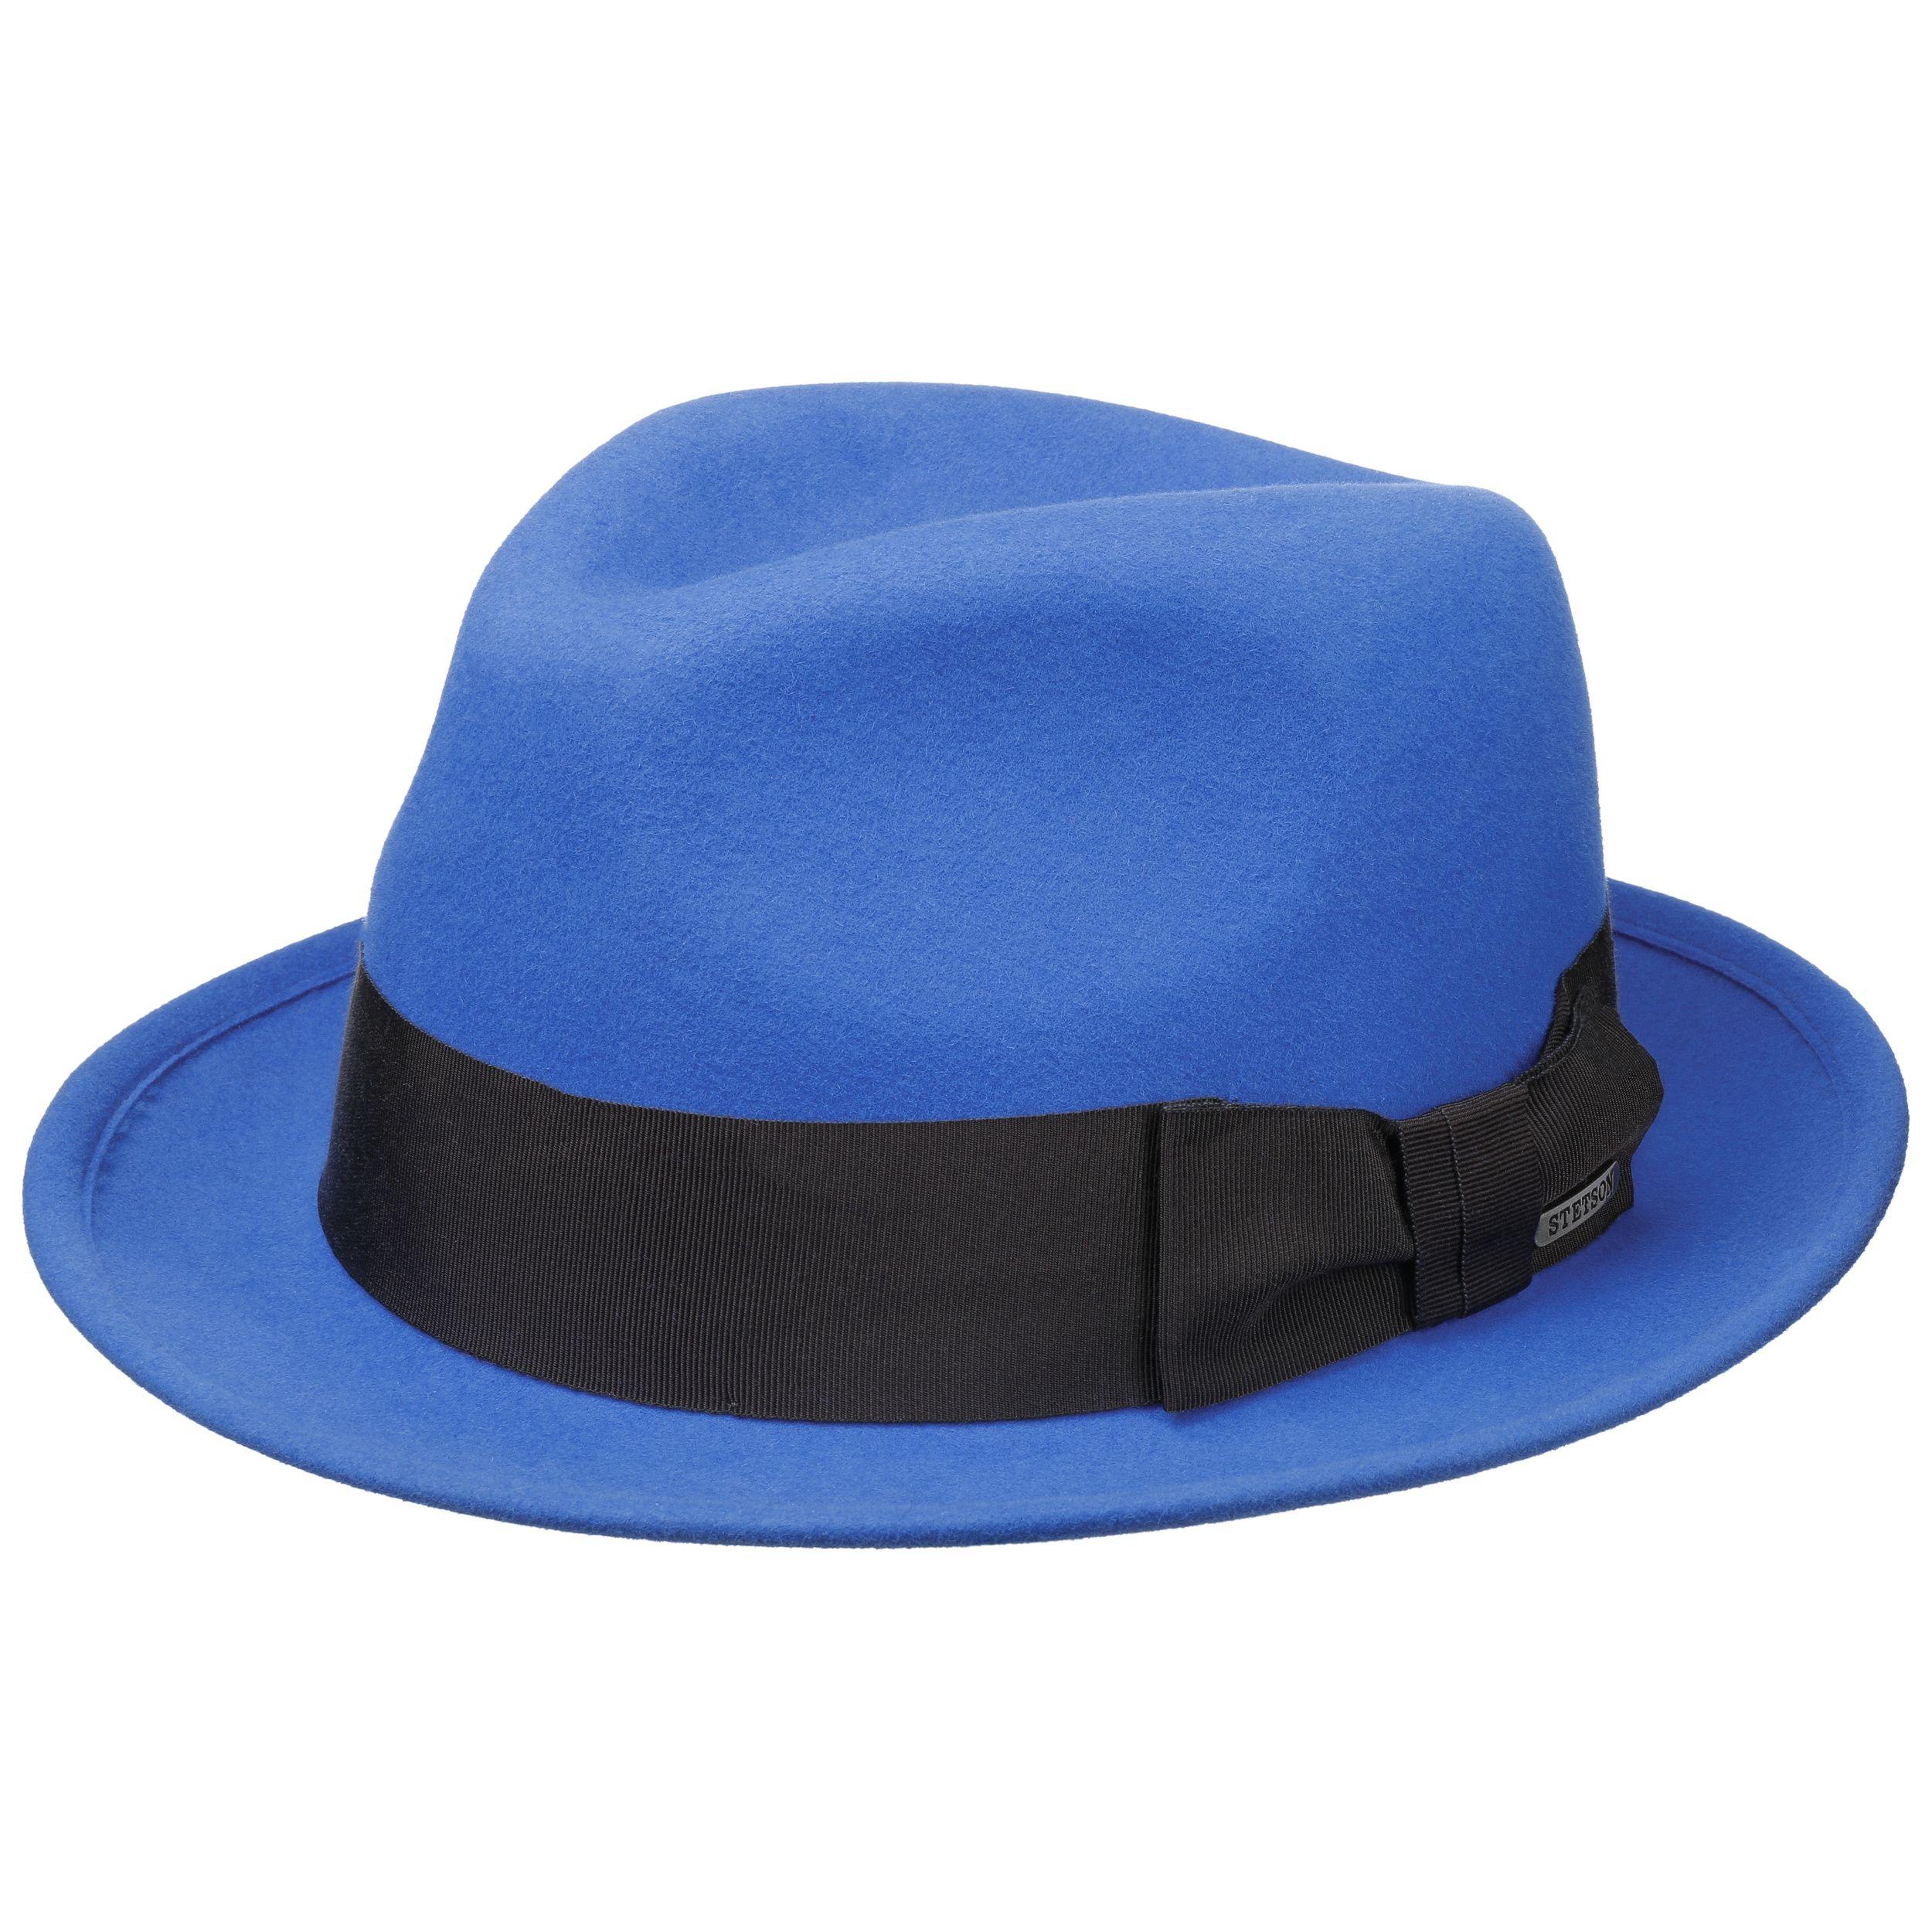 Marico Player Haarvilthoed blauw